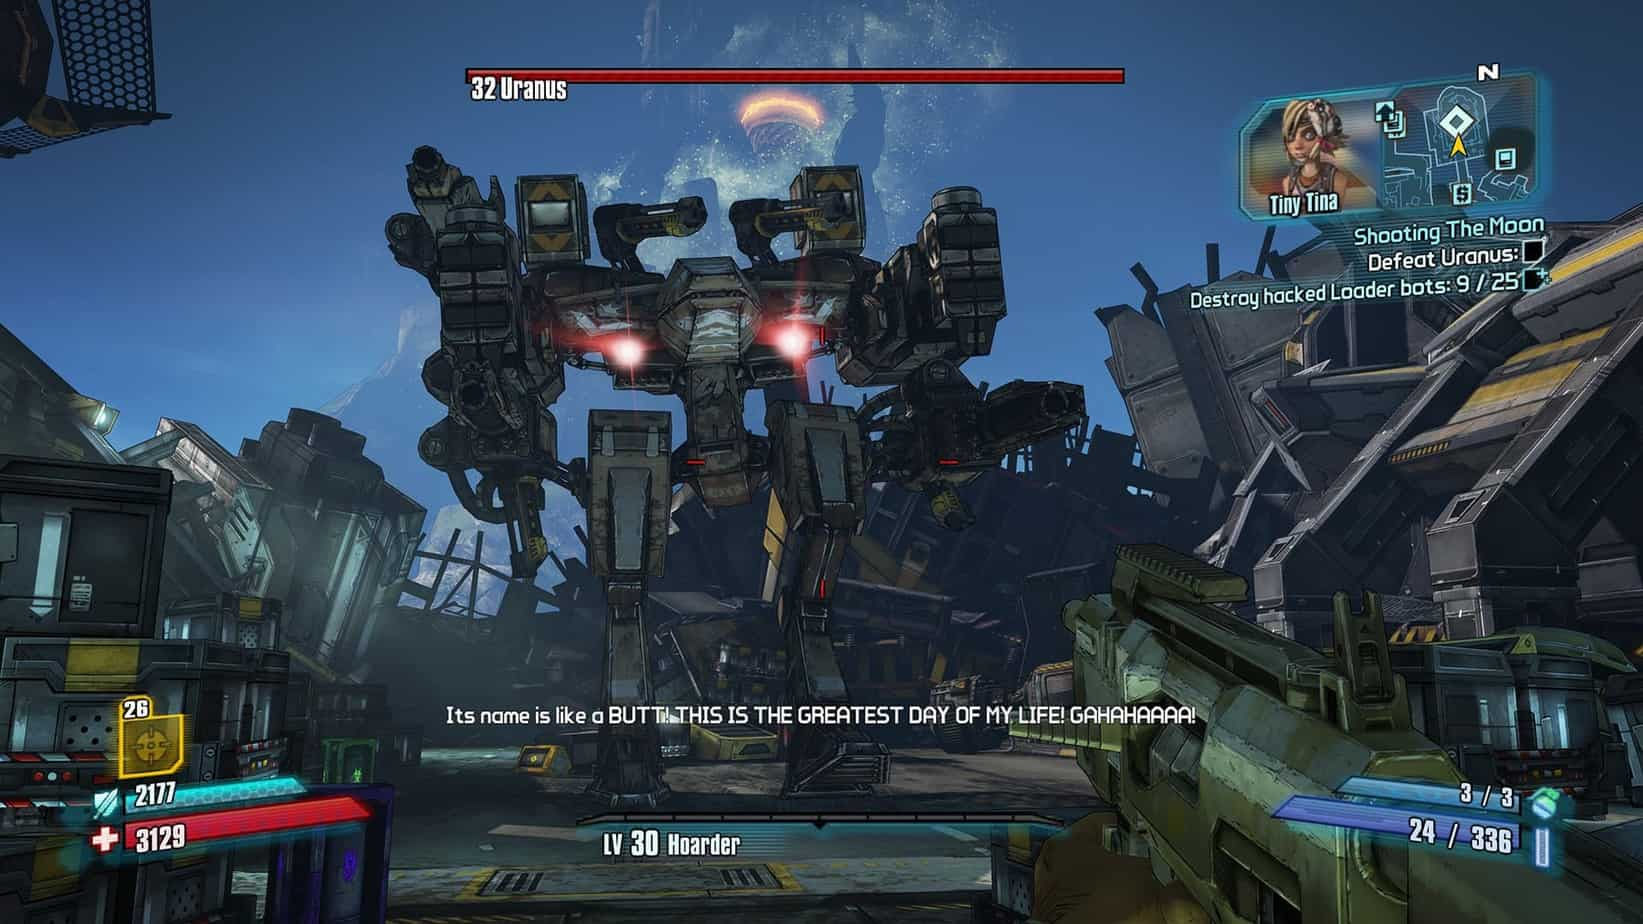 Borderlands 2 Commander Lilith & The Fight For Sanctuary графика